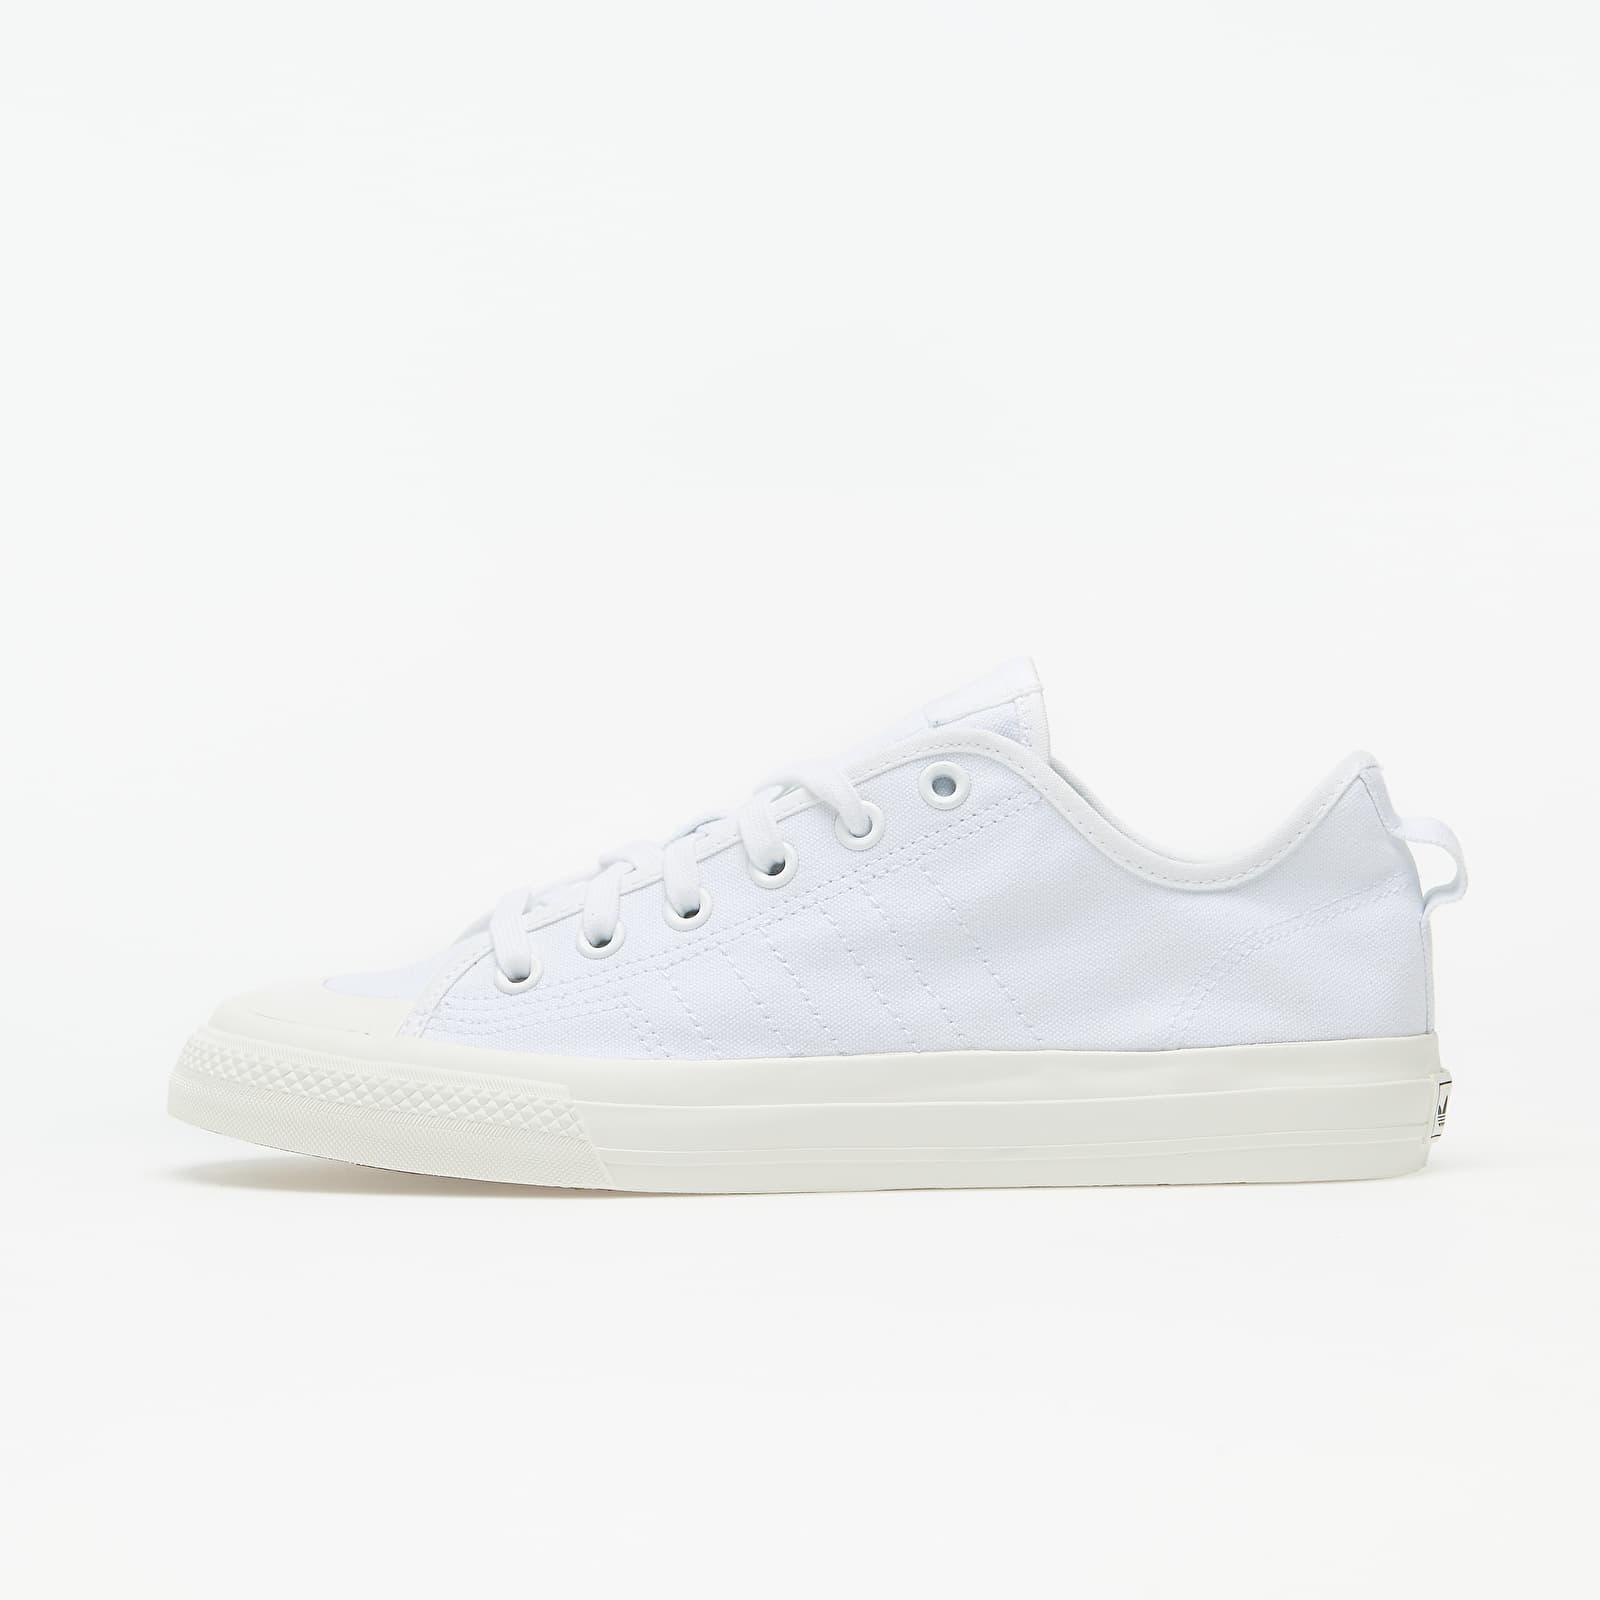 adidas Nizza RF Ftw White/ Ftw White/ Off White EF1883